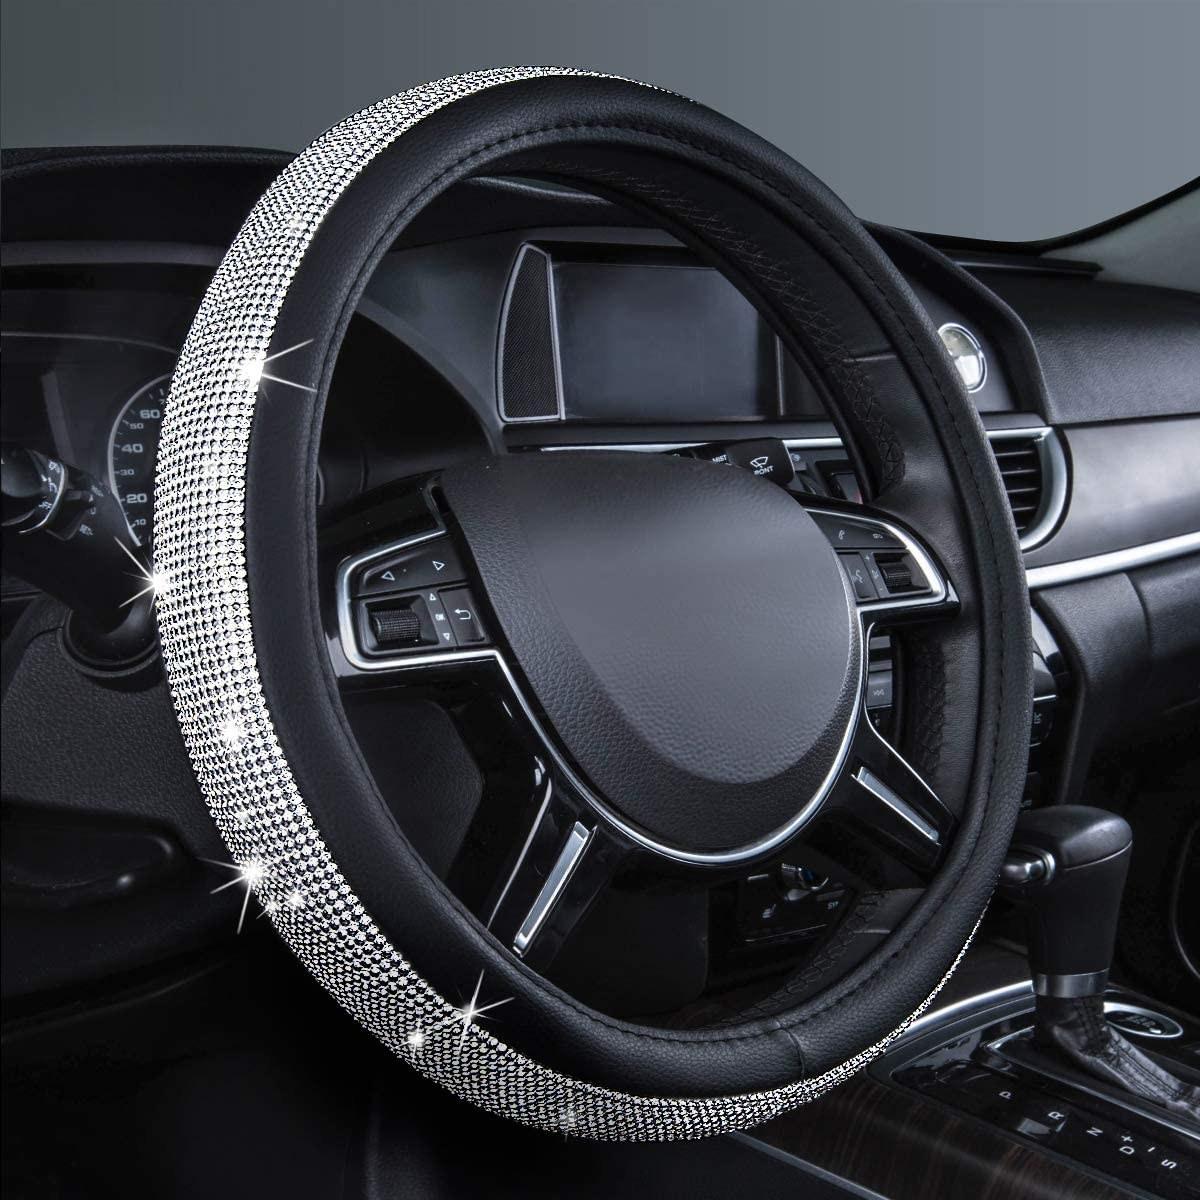 the steering wheel cover on a steering wheel